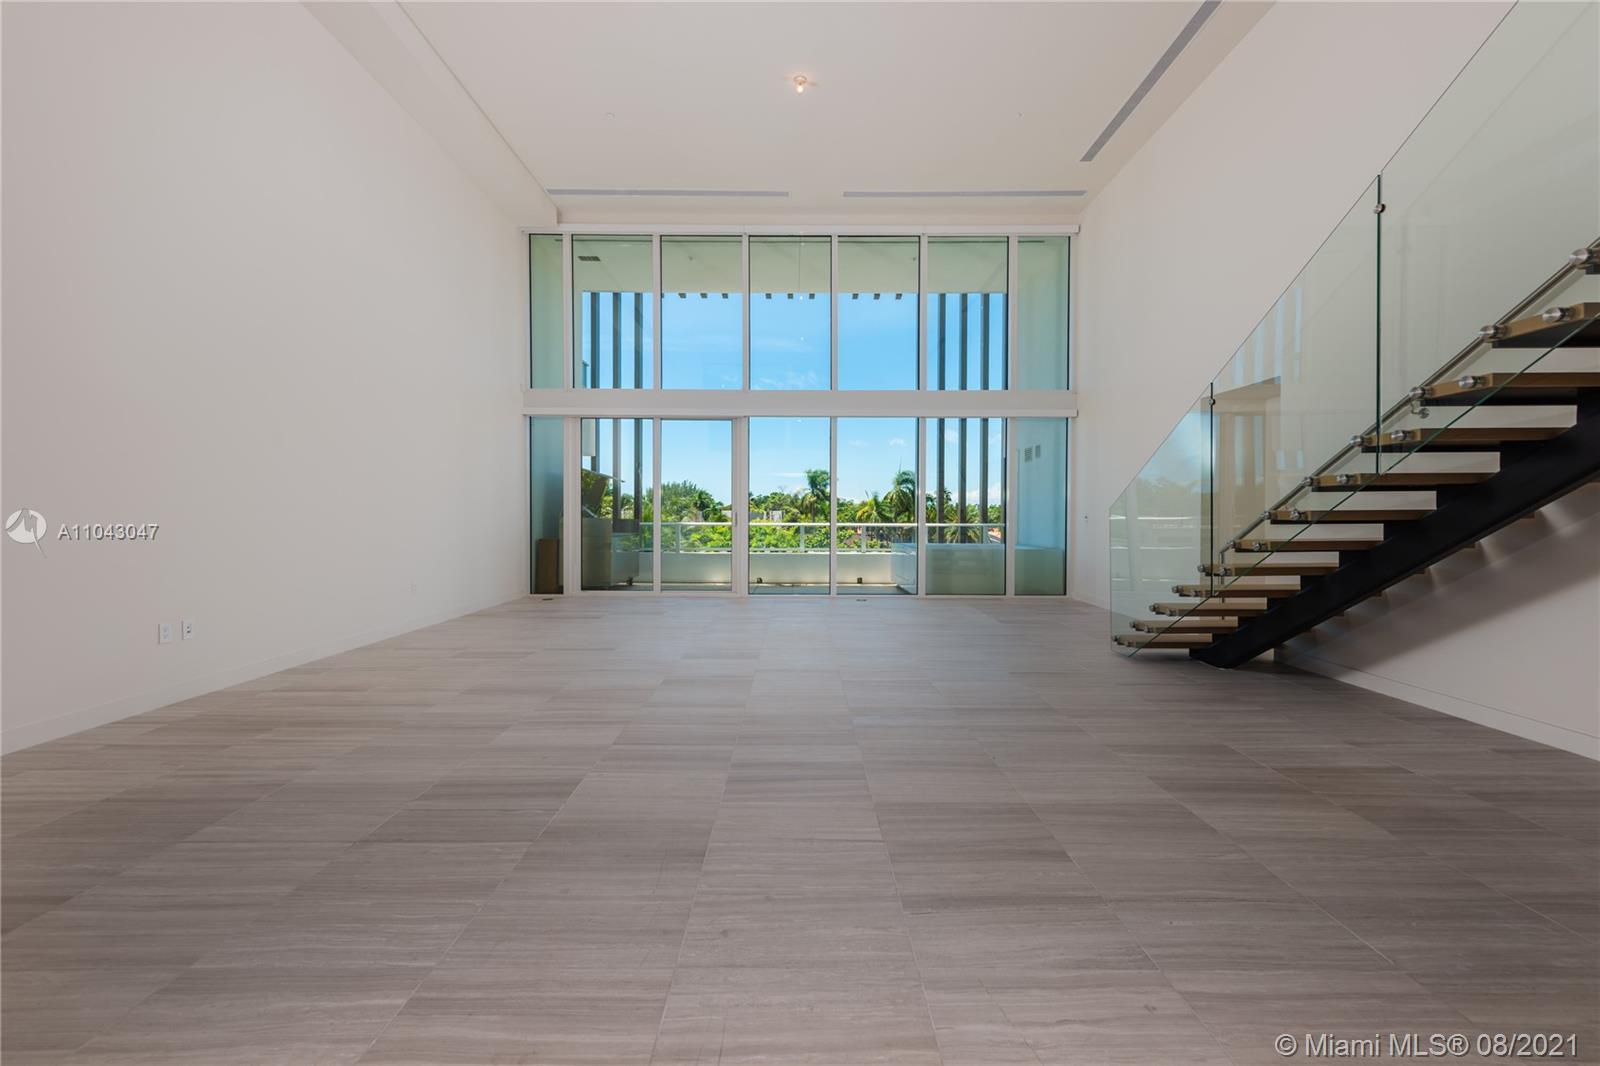 4701 Meridian Ave Unit 319, Miami Beach, Florida 33140